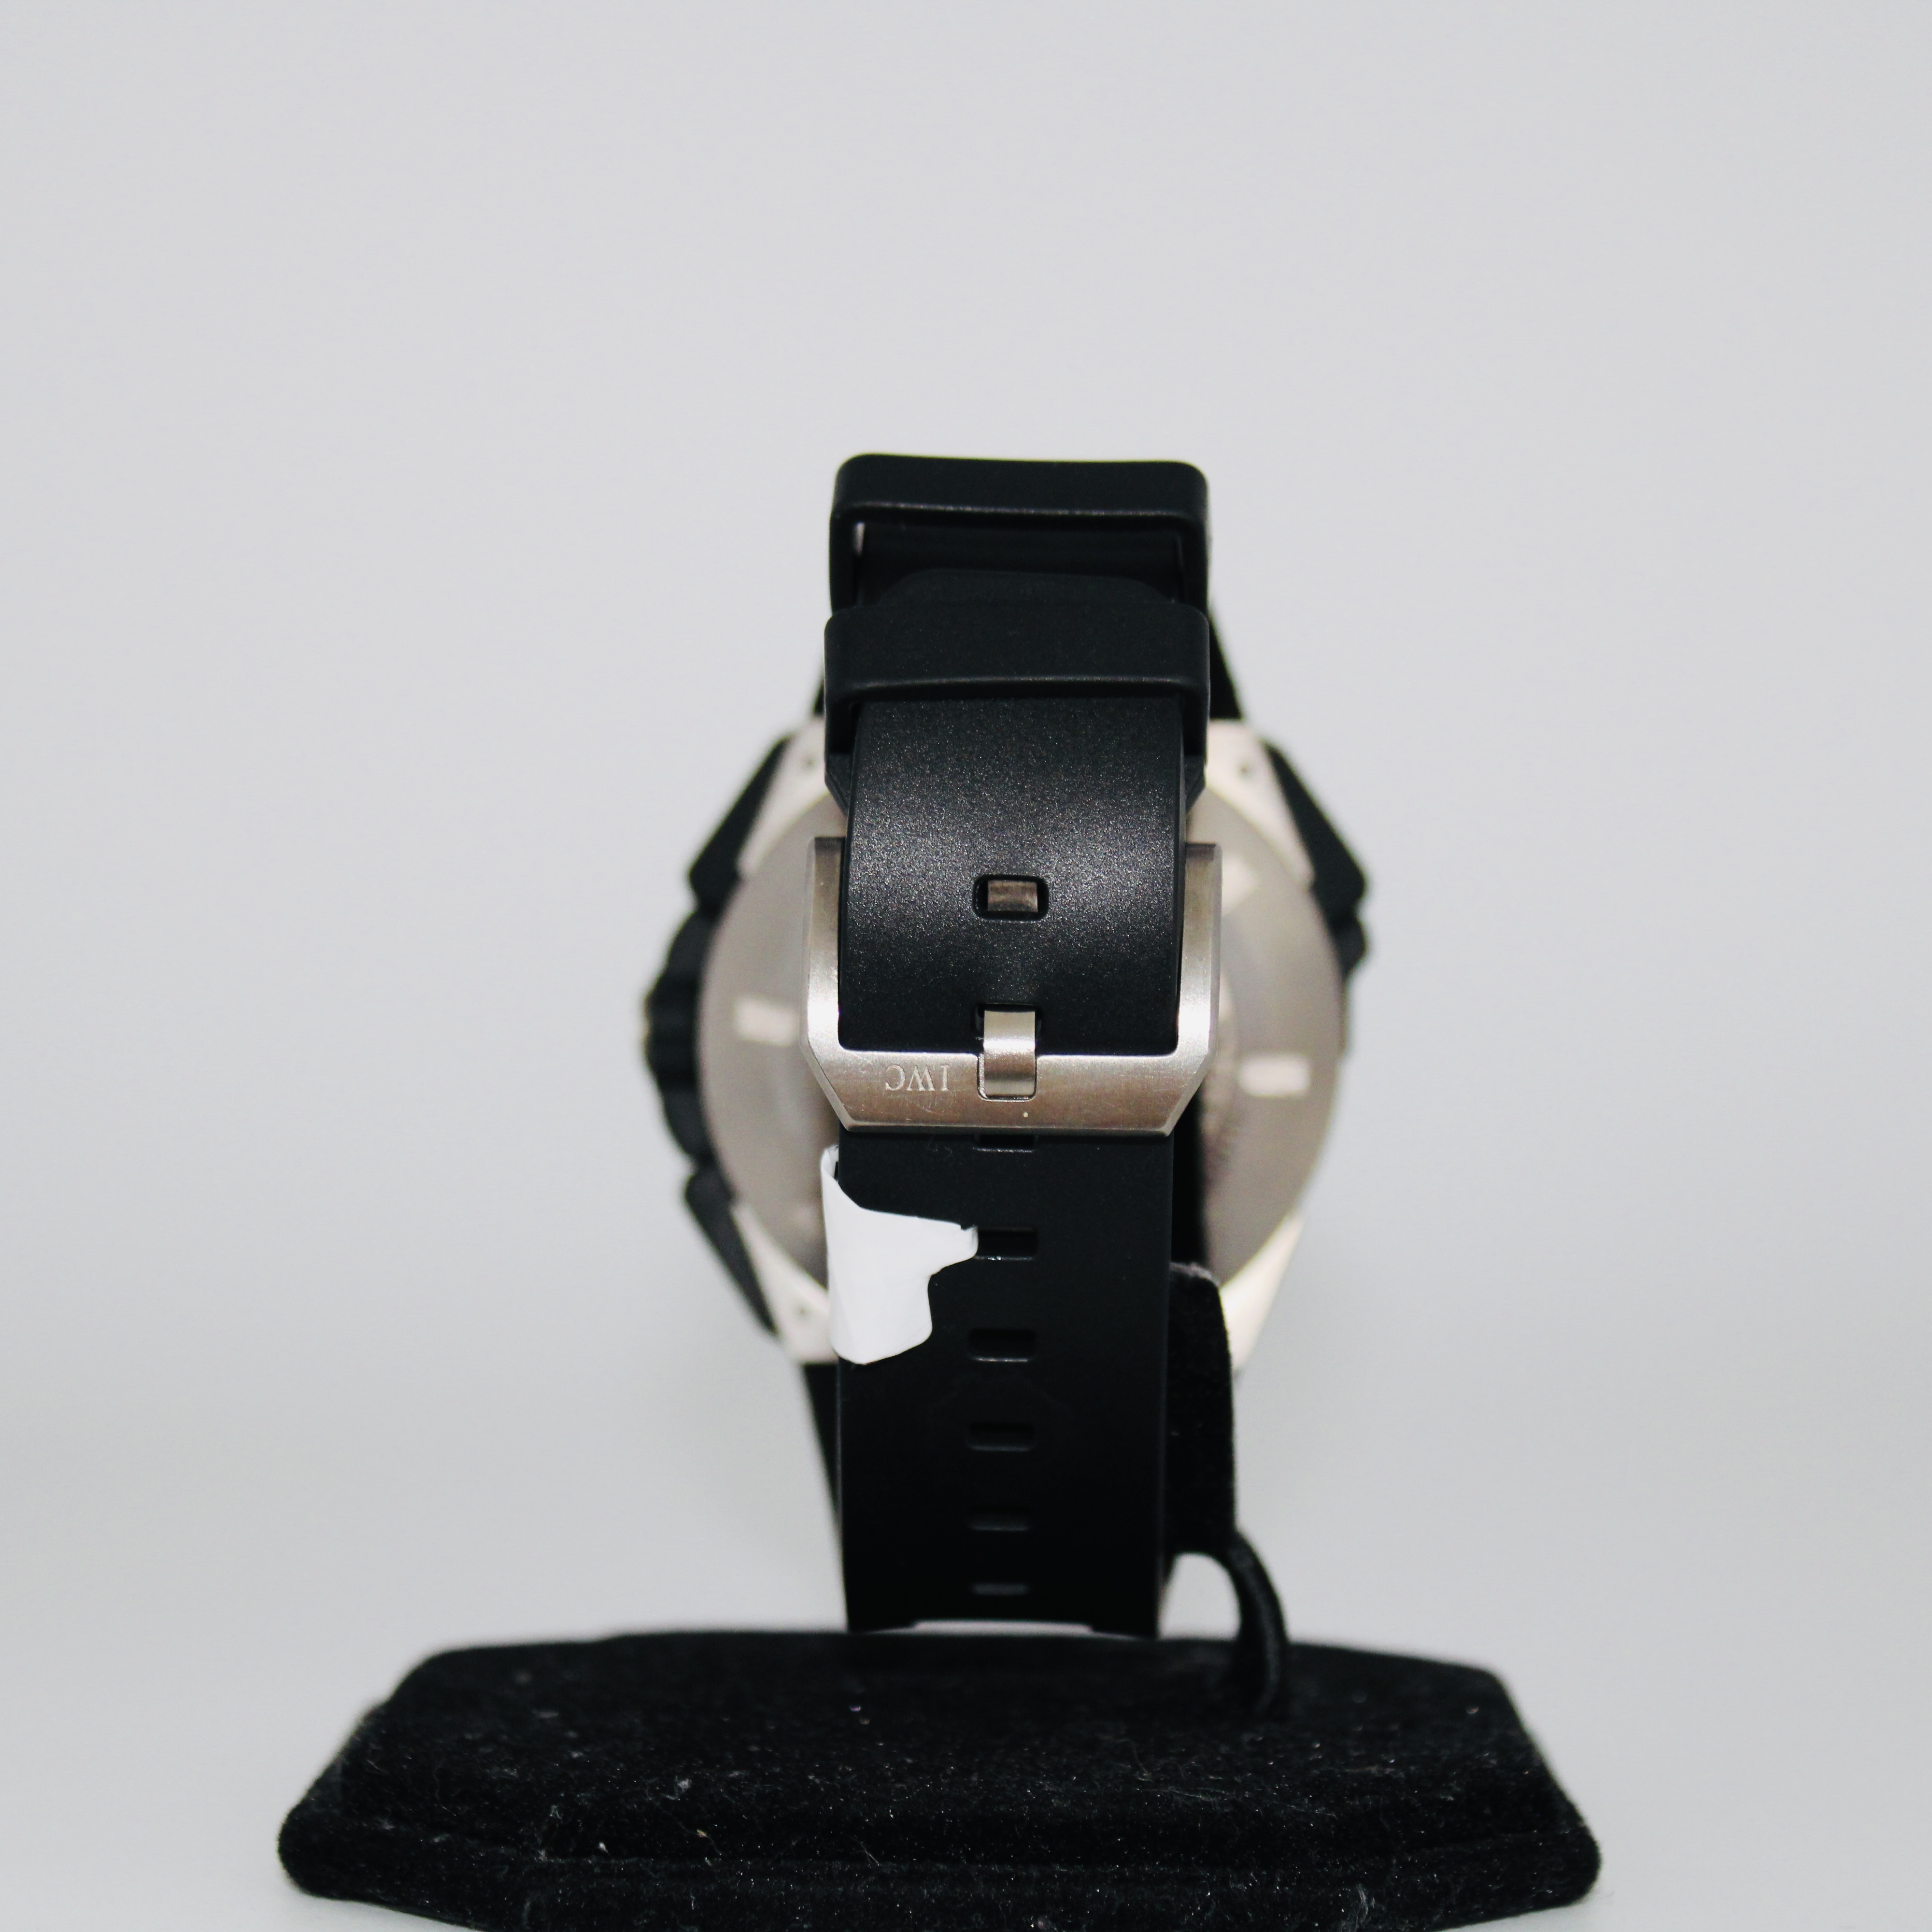 IWC Ingenieur Double Chronograph ref IW37650 - Image 4 of 5